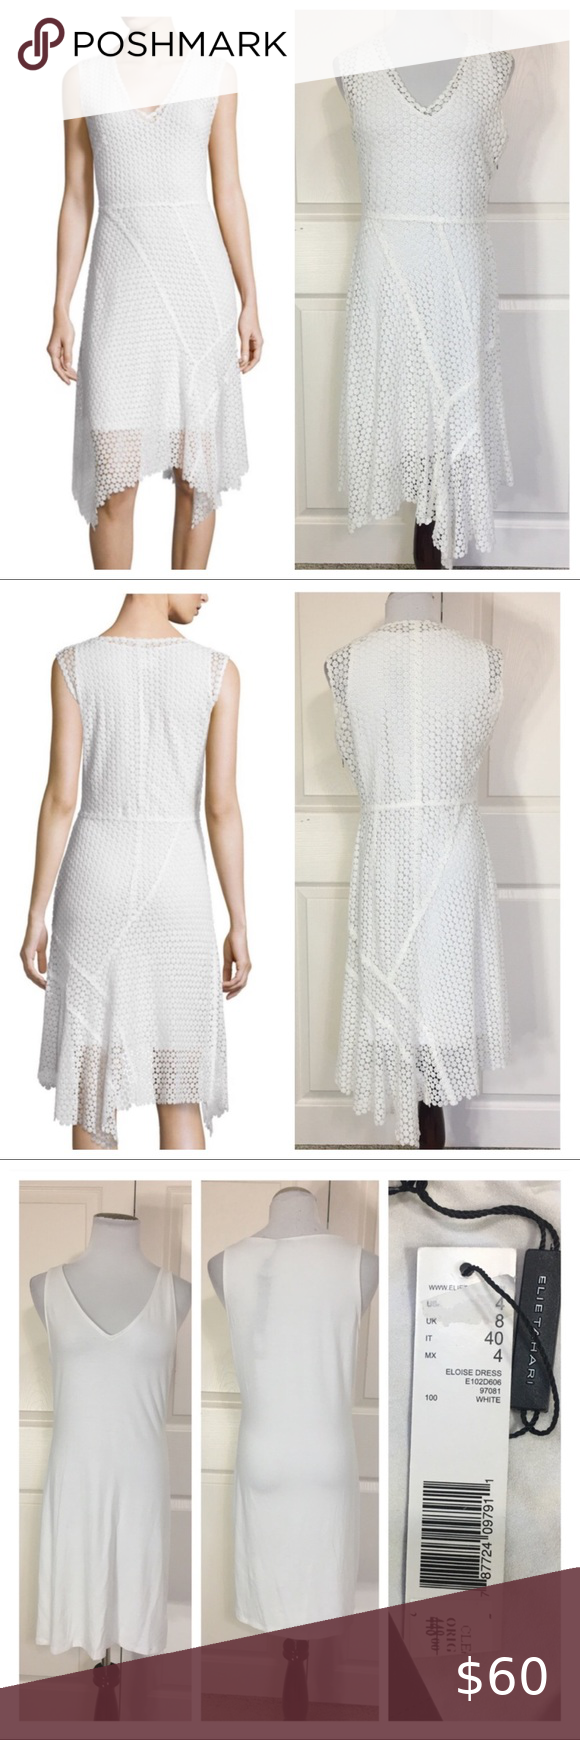 Nwt Elie Tahari Eloise White Lace Dress New With Tags Elie Tahari Eloise White Lace Dress Slip Into Sweet Summer Styl Lace White Dress Lace Dress Lacy Dress [ 1740 x 580 Pixel ]